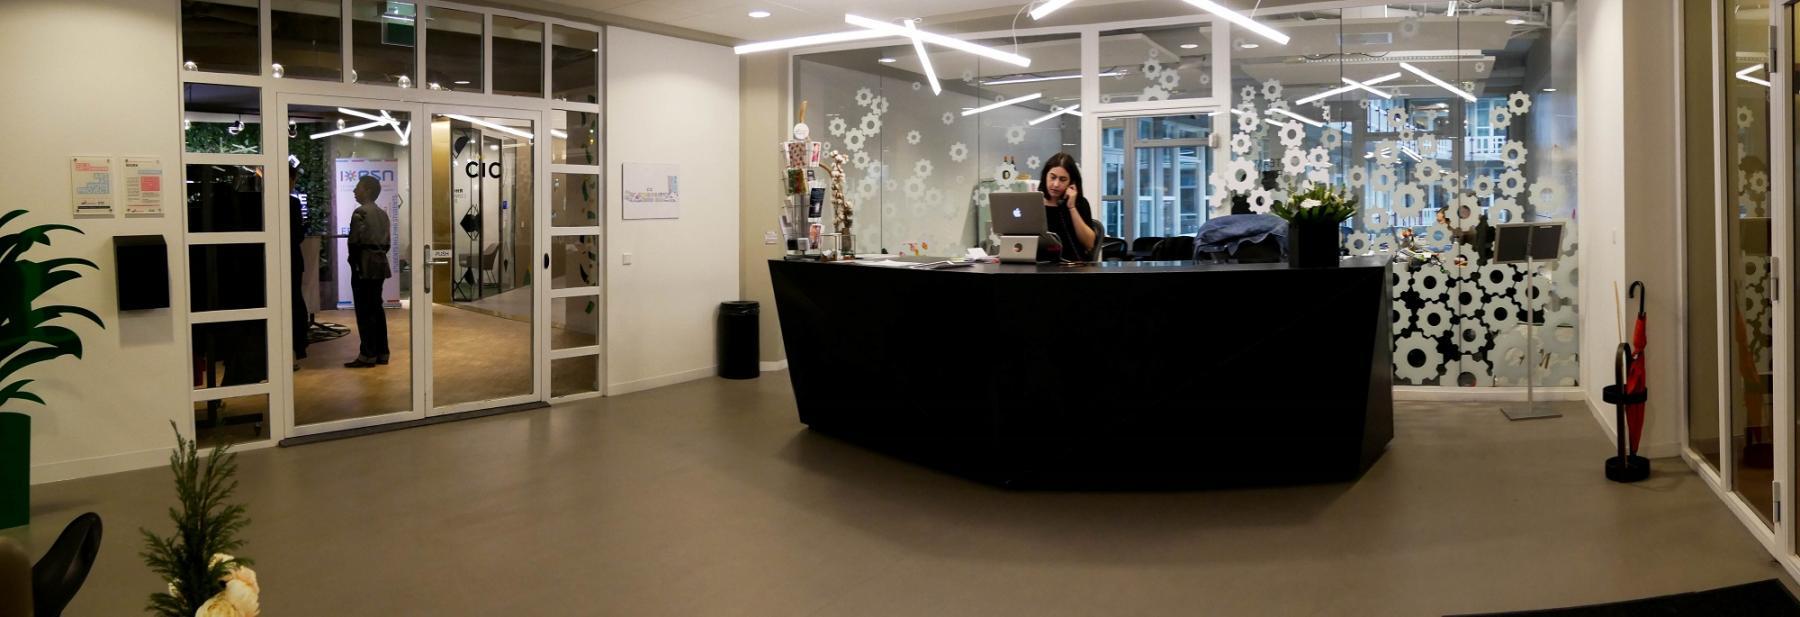 reception people open space employee